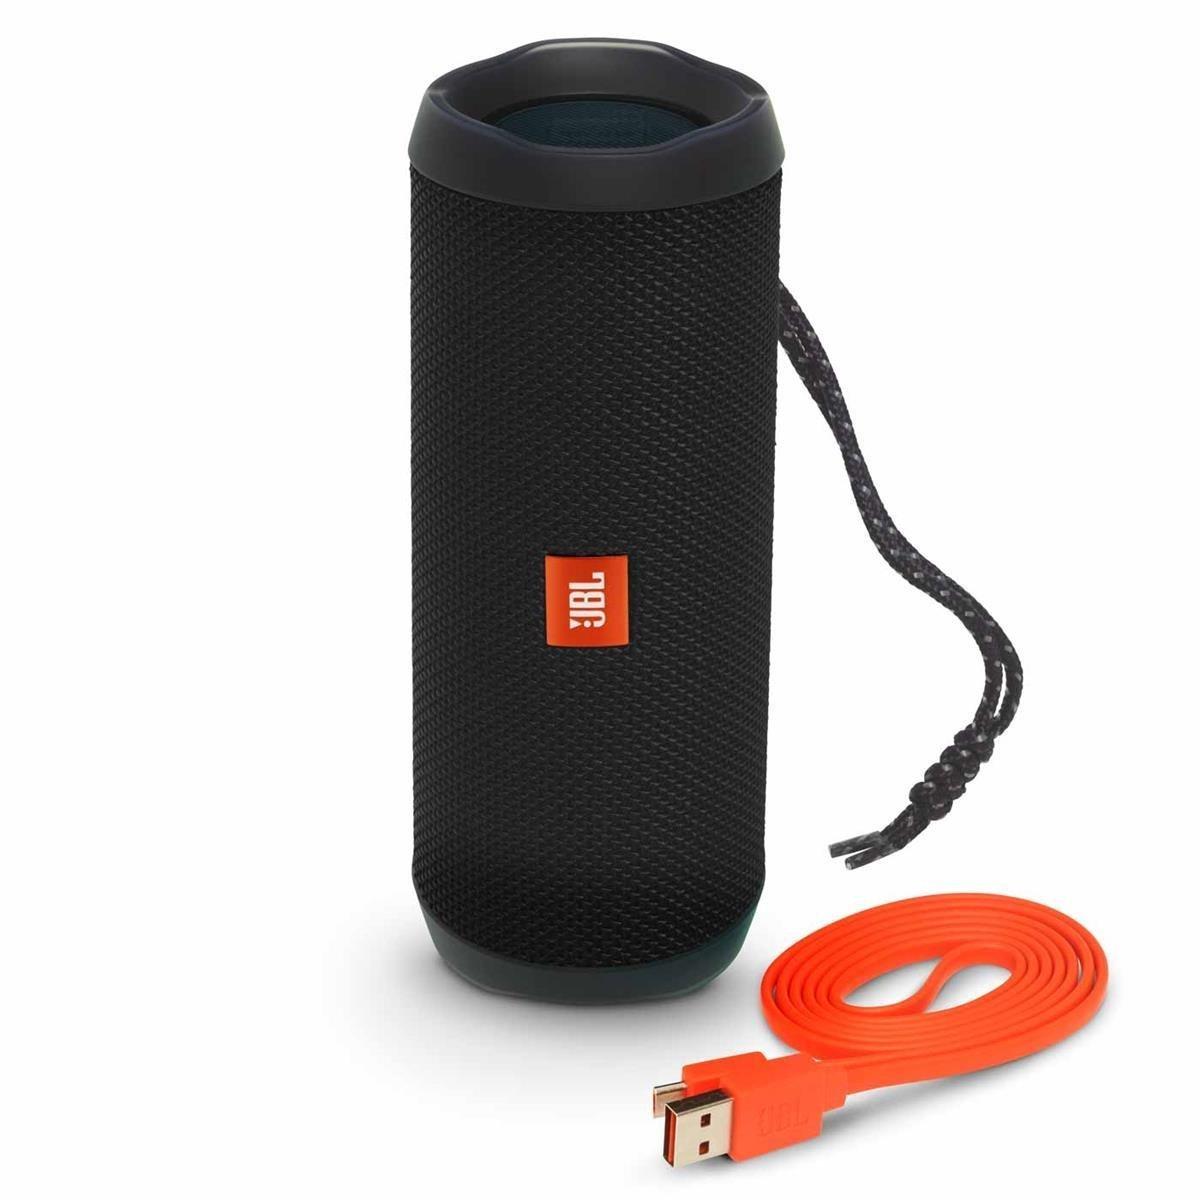 JBL Flip 4 Waterproof Portable Bluetooth Speaker - Black by JBL